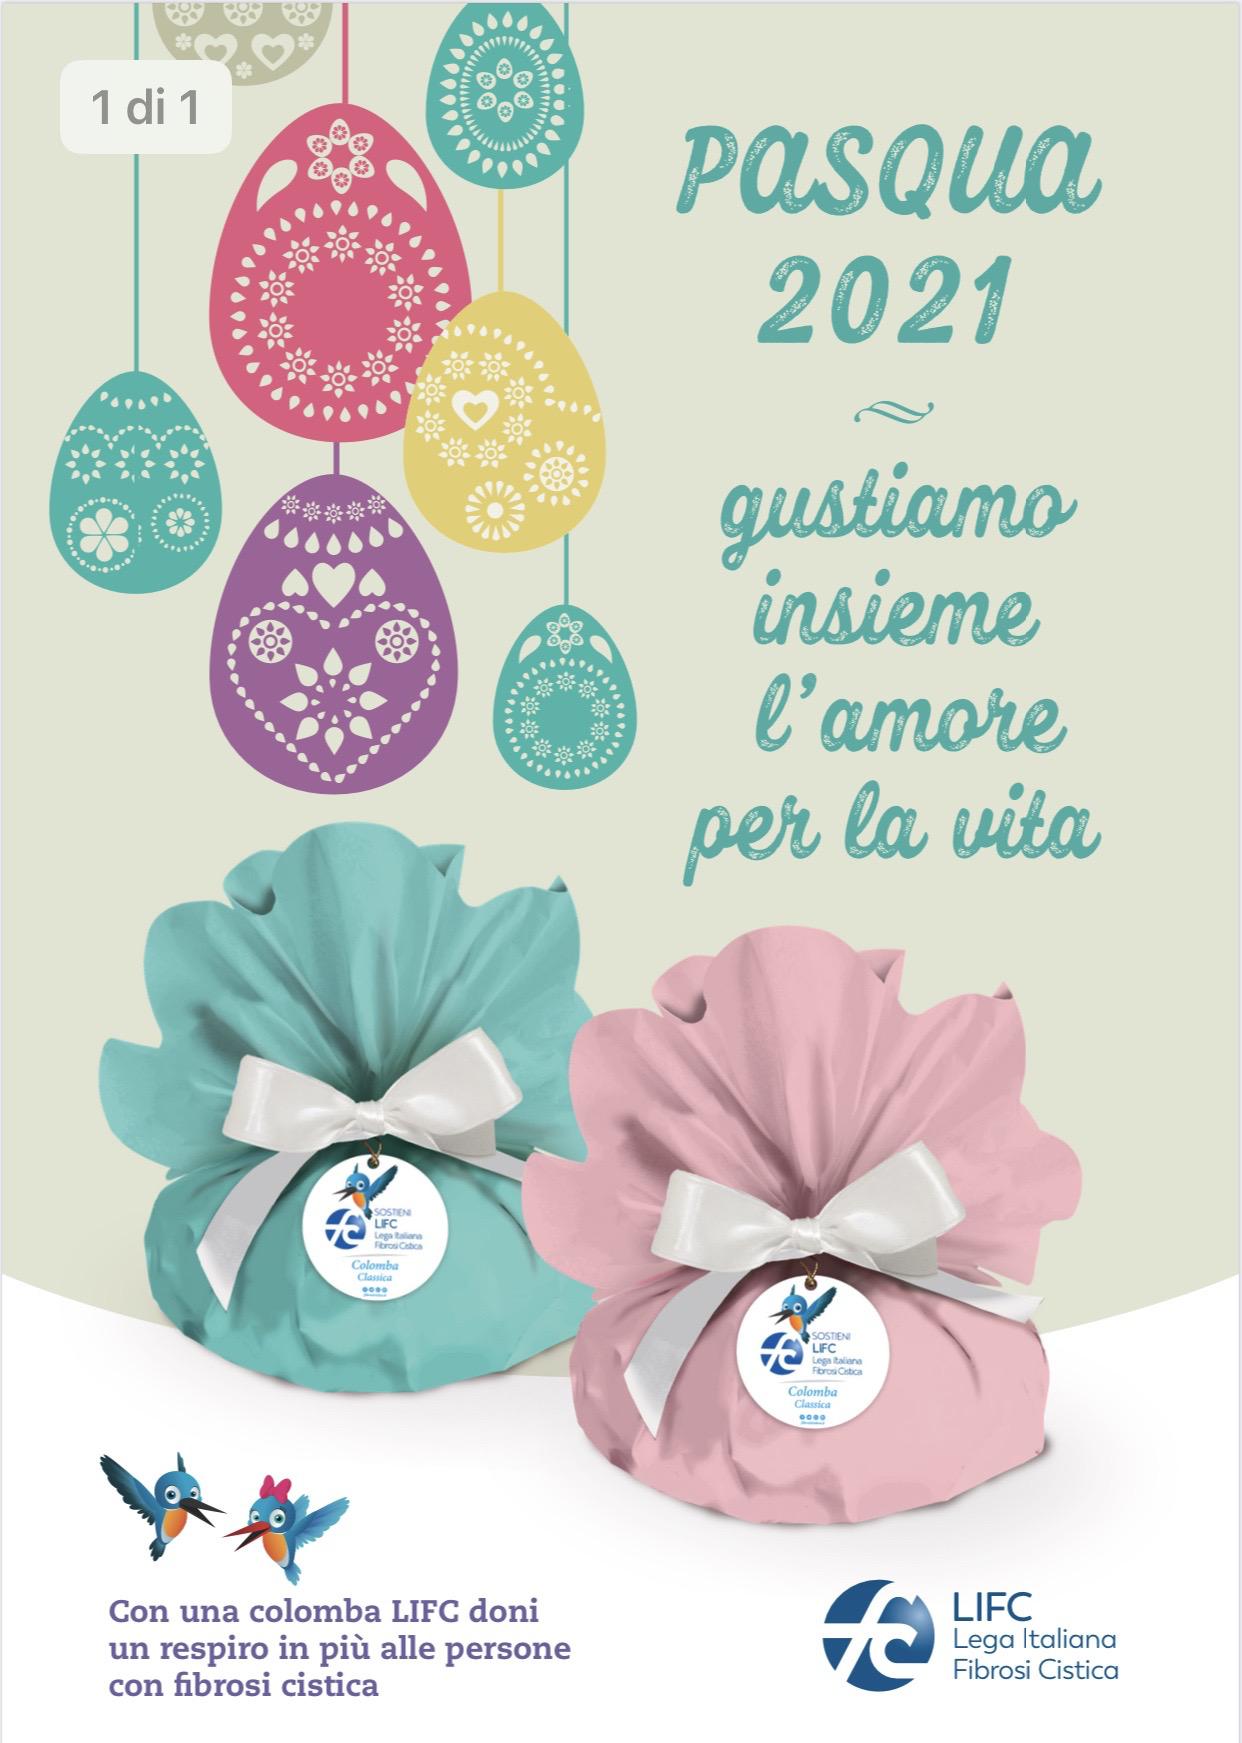 Pasqua LIFC 2021